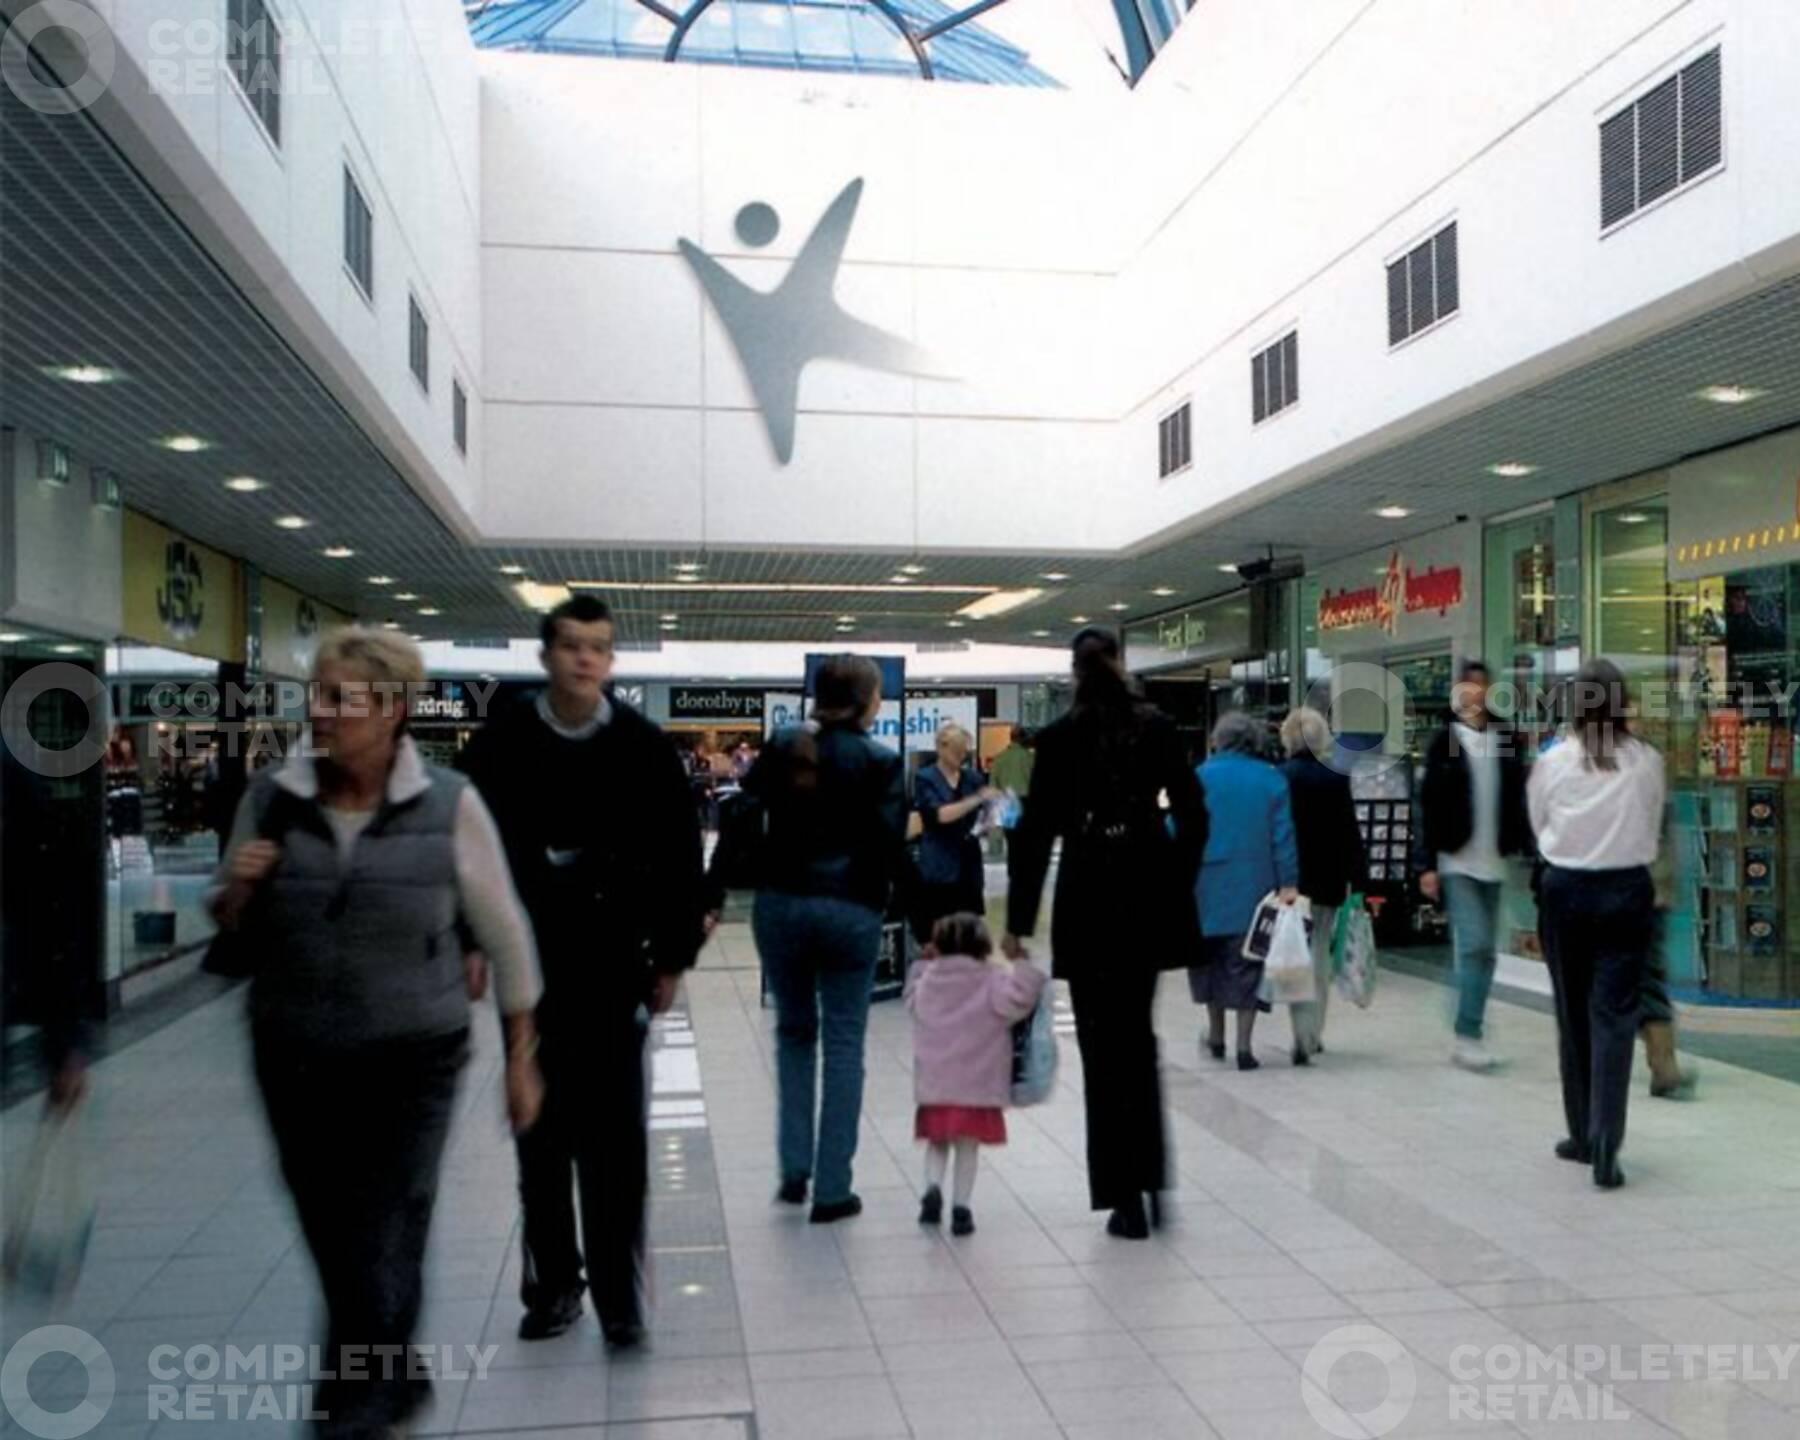 Kingsgate Shopping Centre